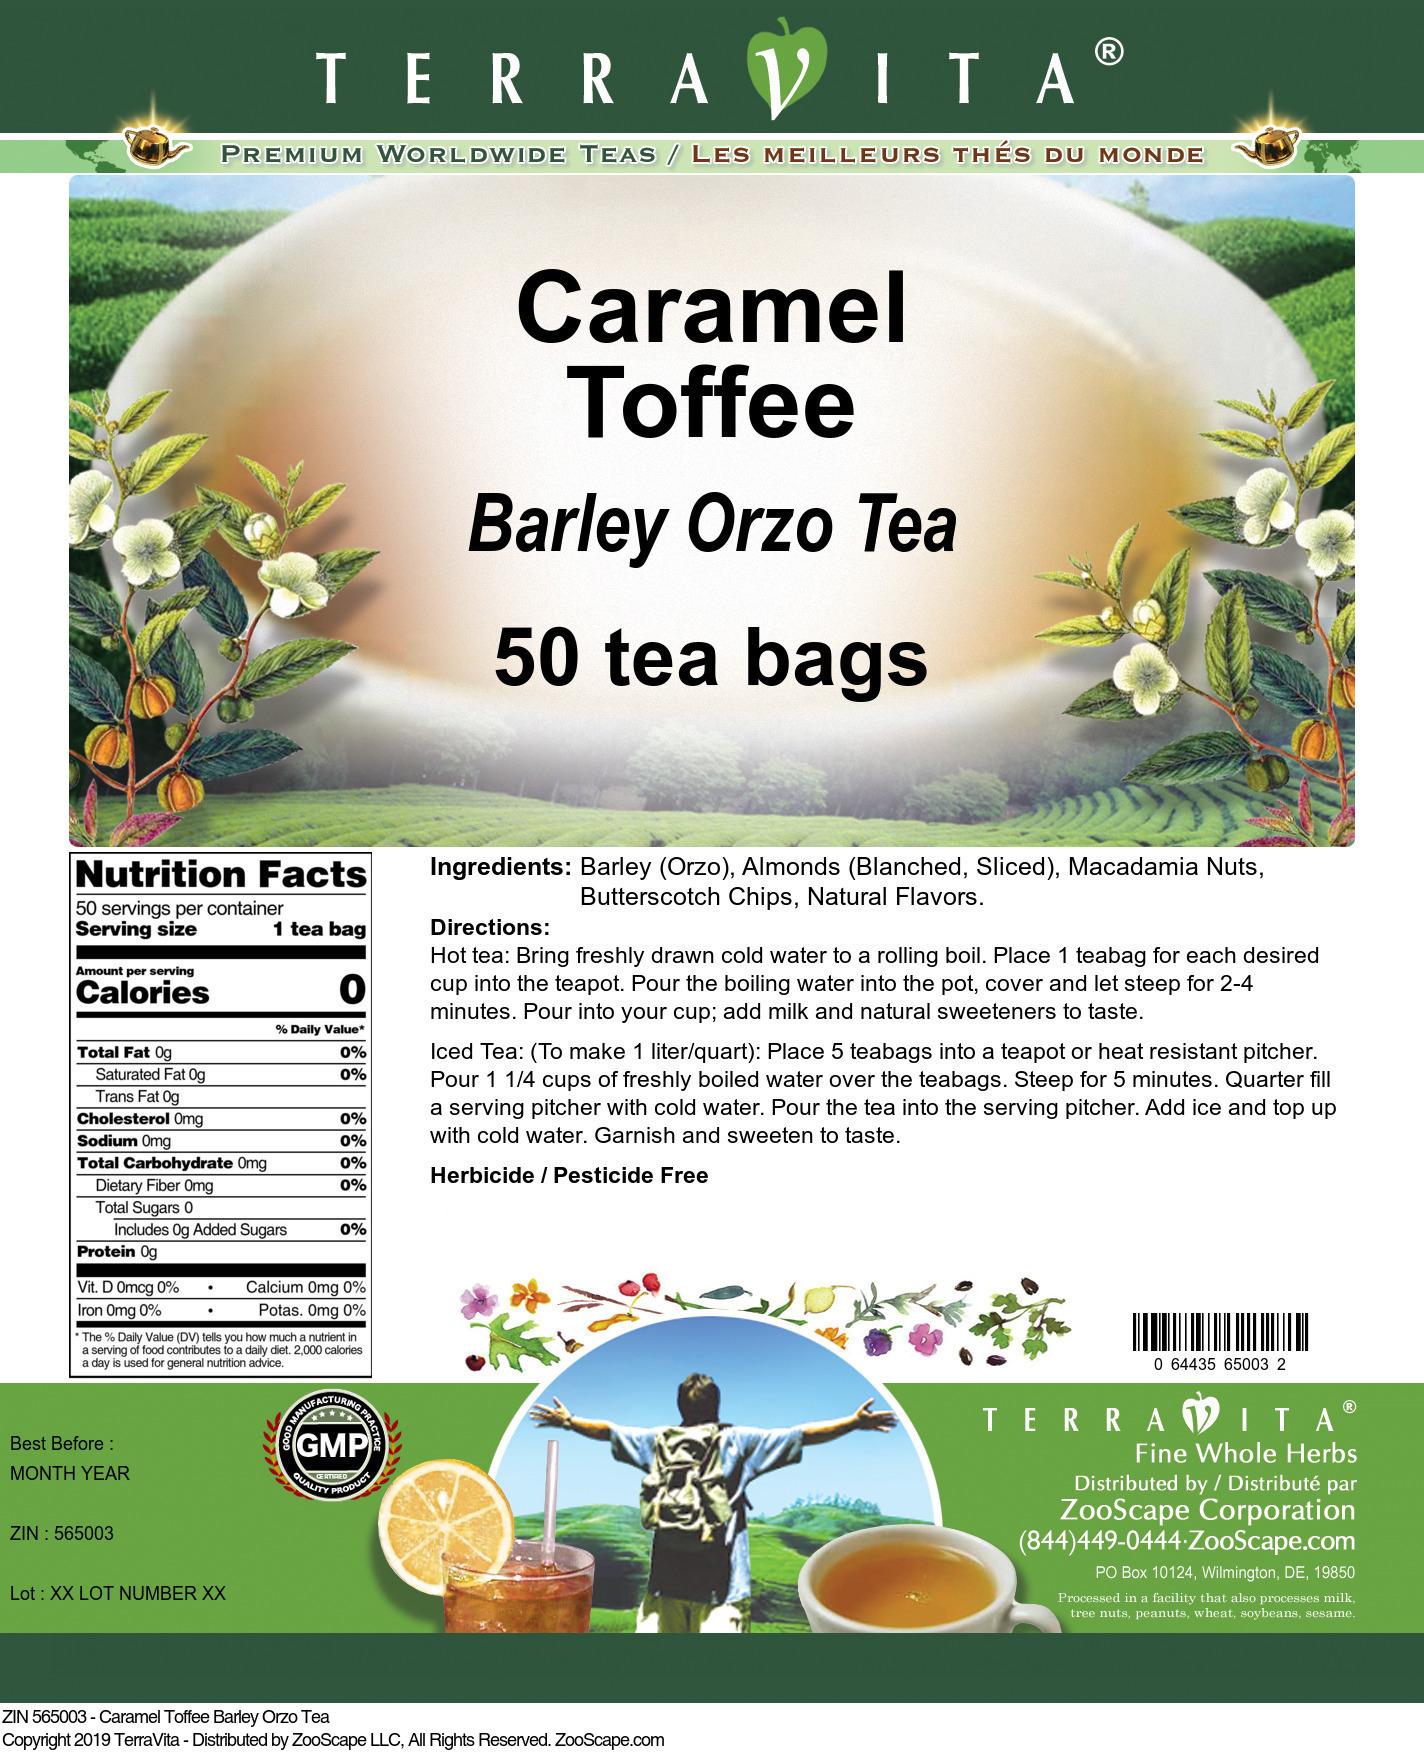 Caramel Toffee Barley Orzo